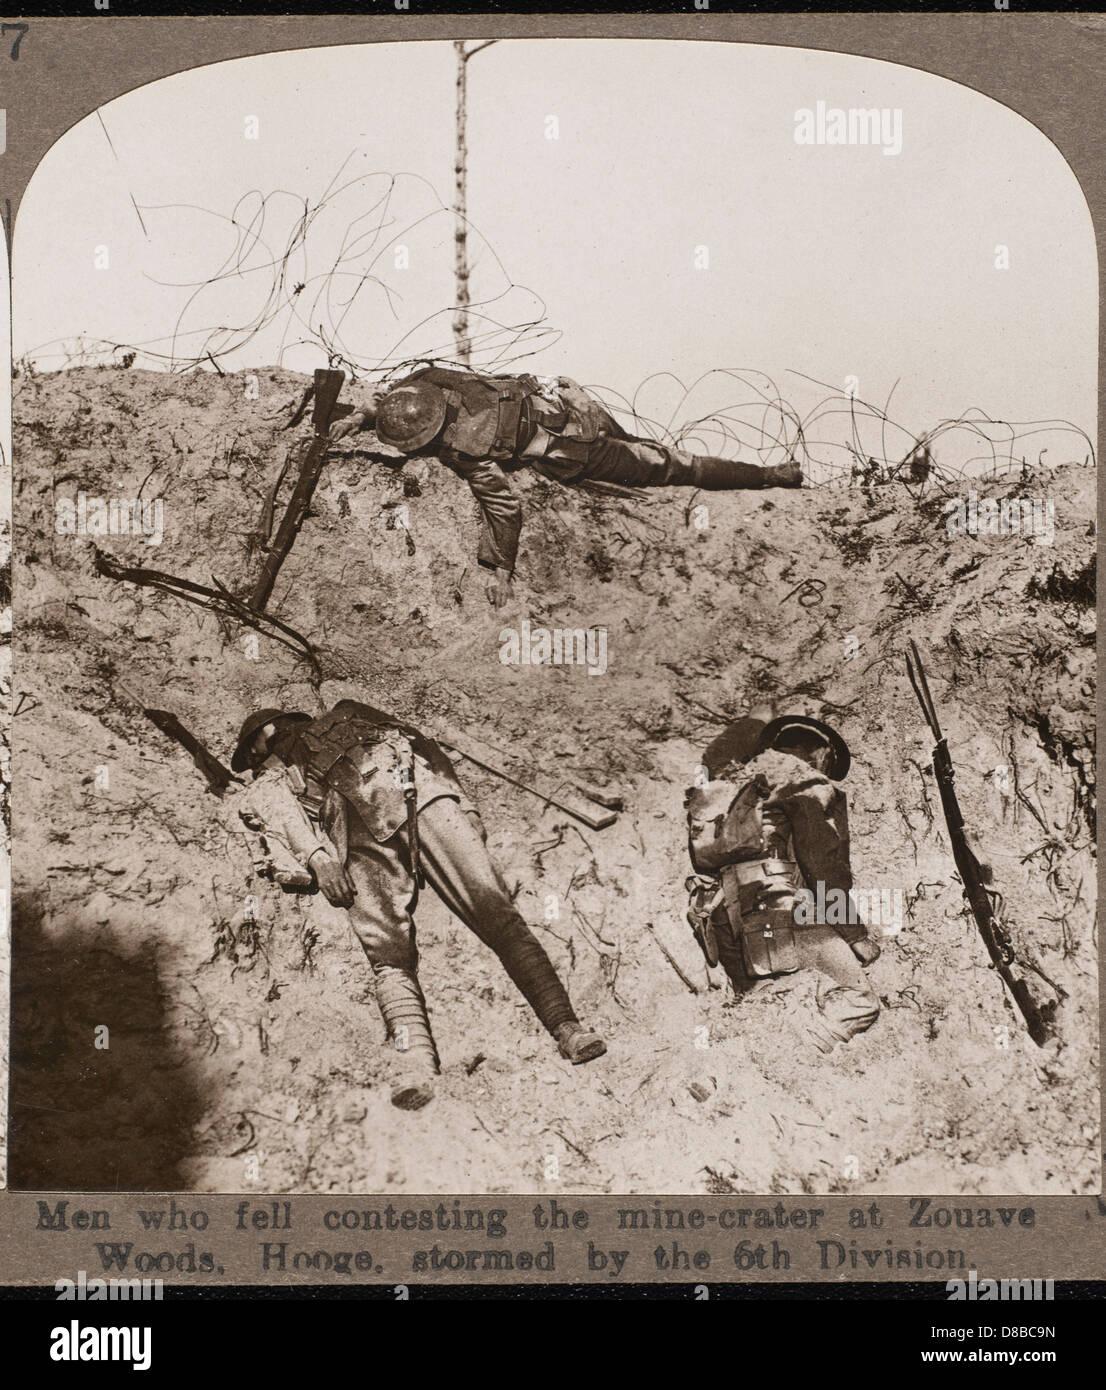 Fallen Soldiers In Ww1 - Stock Image